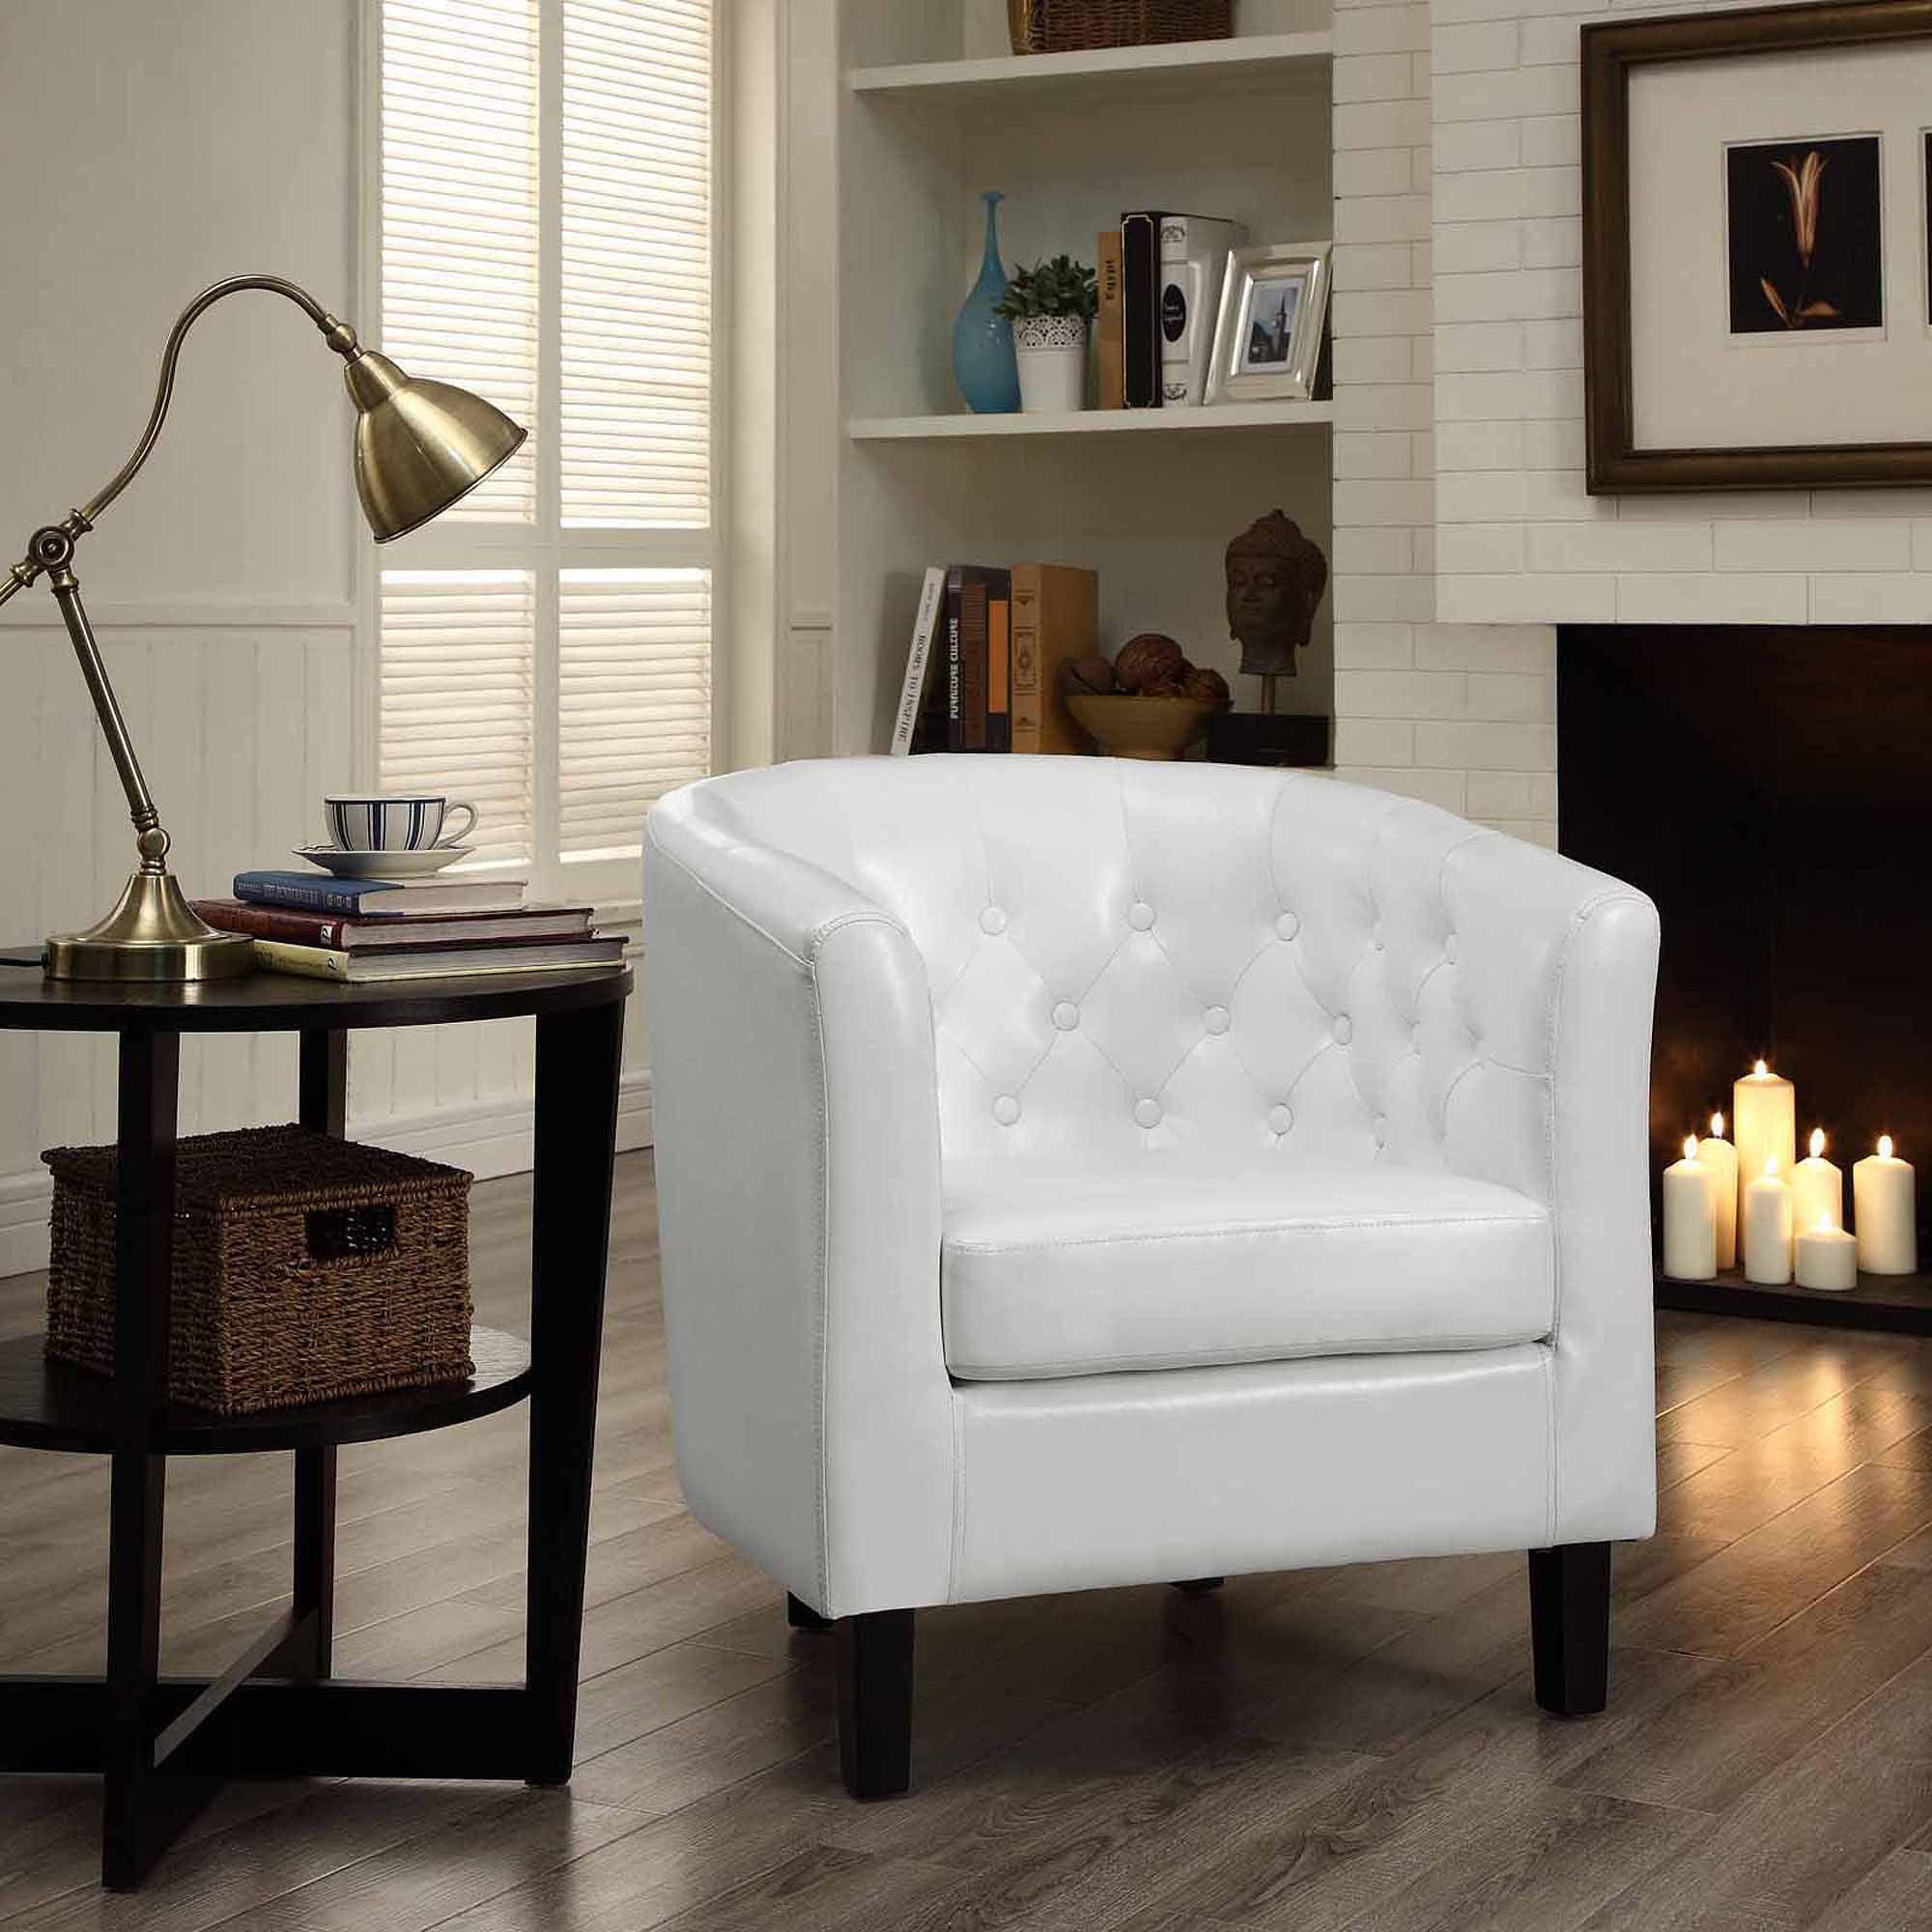 Modway Prospect Leatherette Armchair, Multiple Colors by Modway